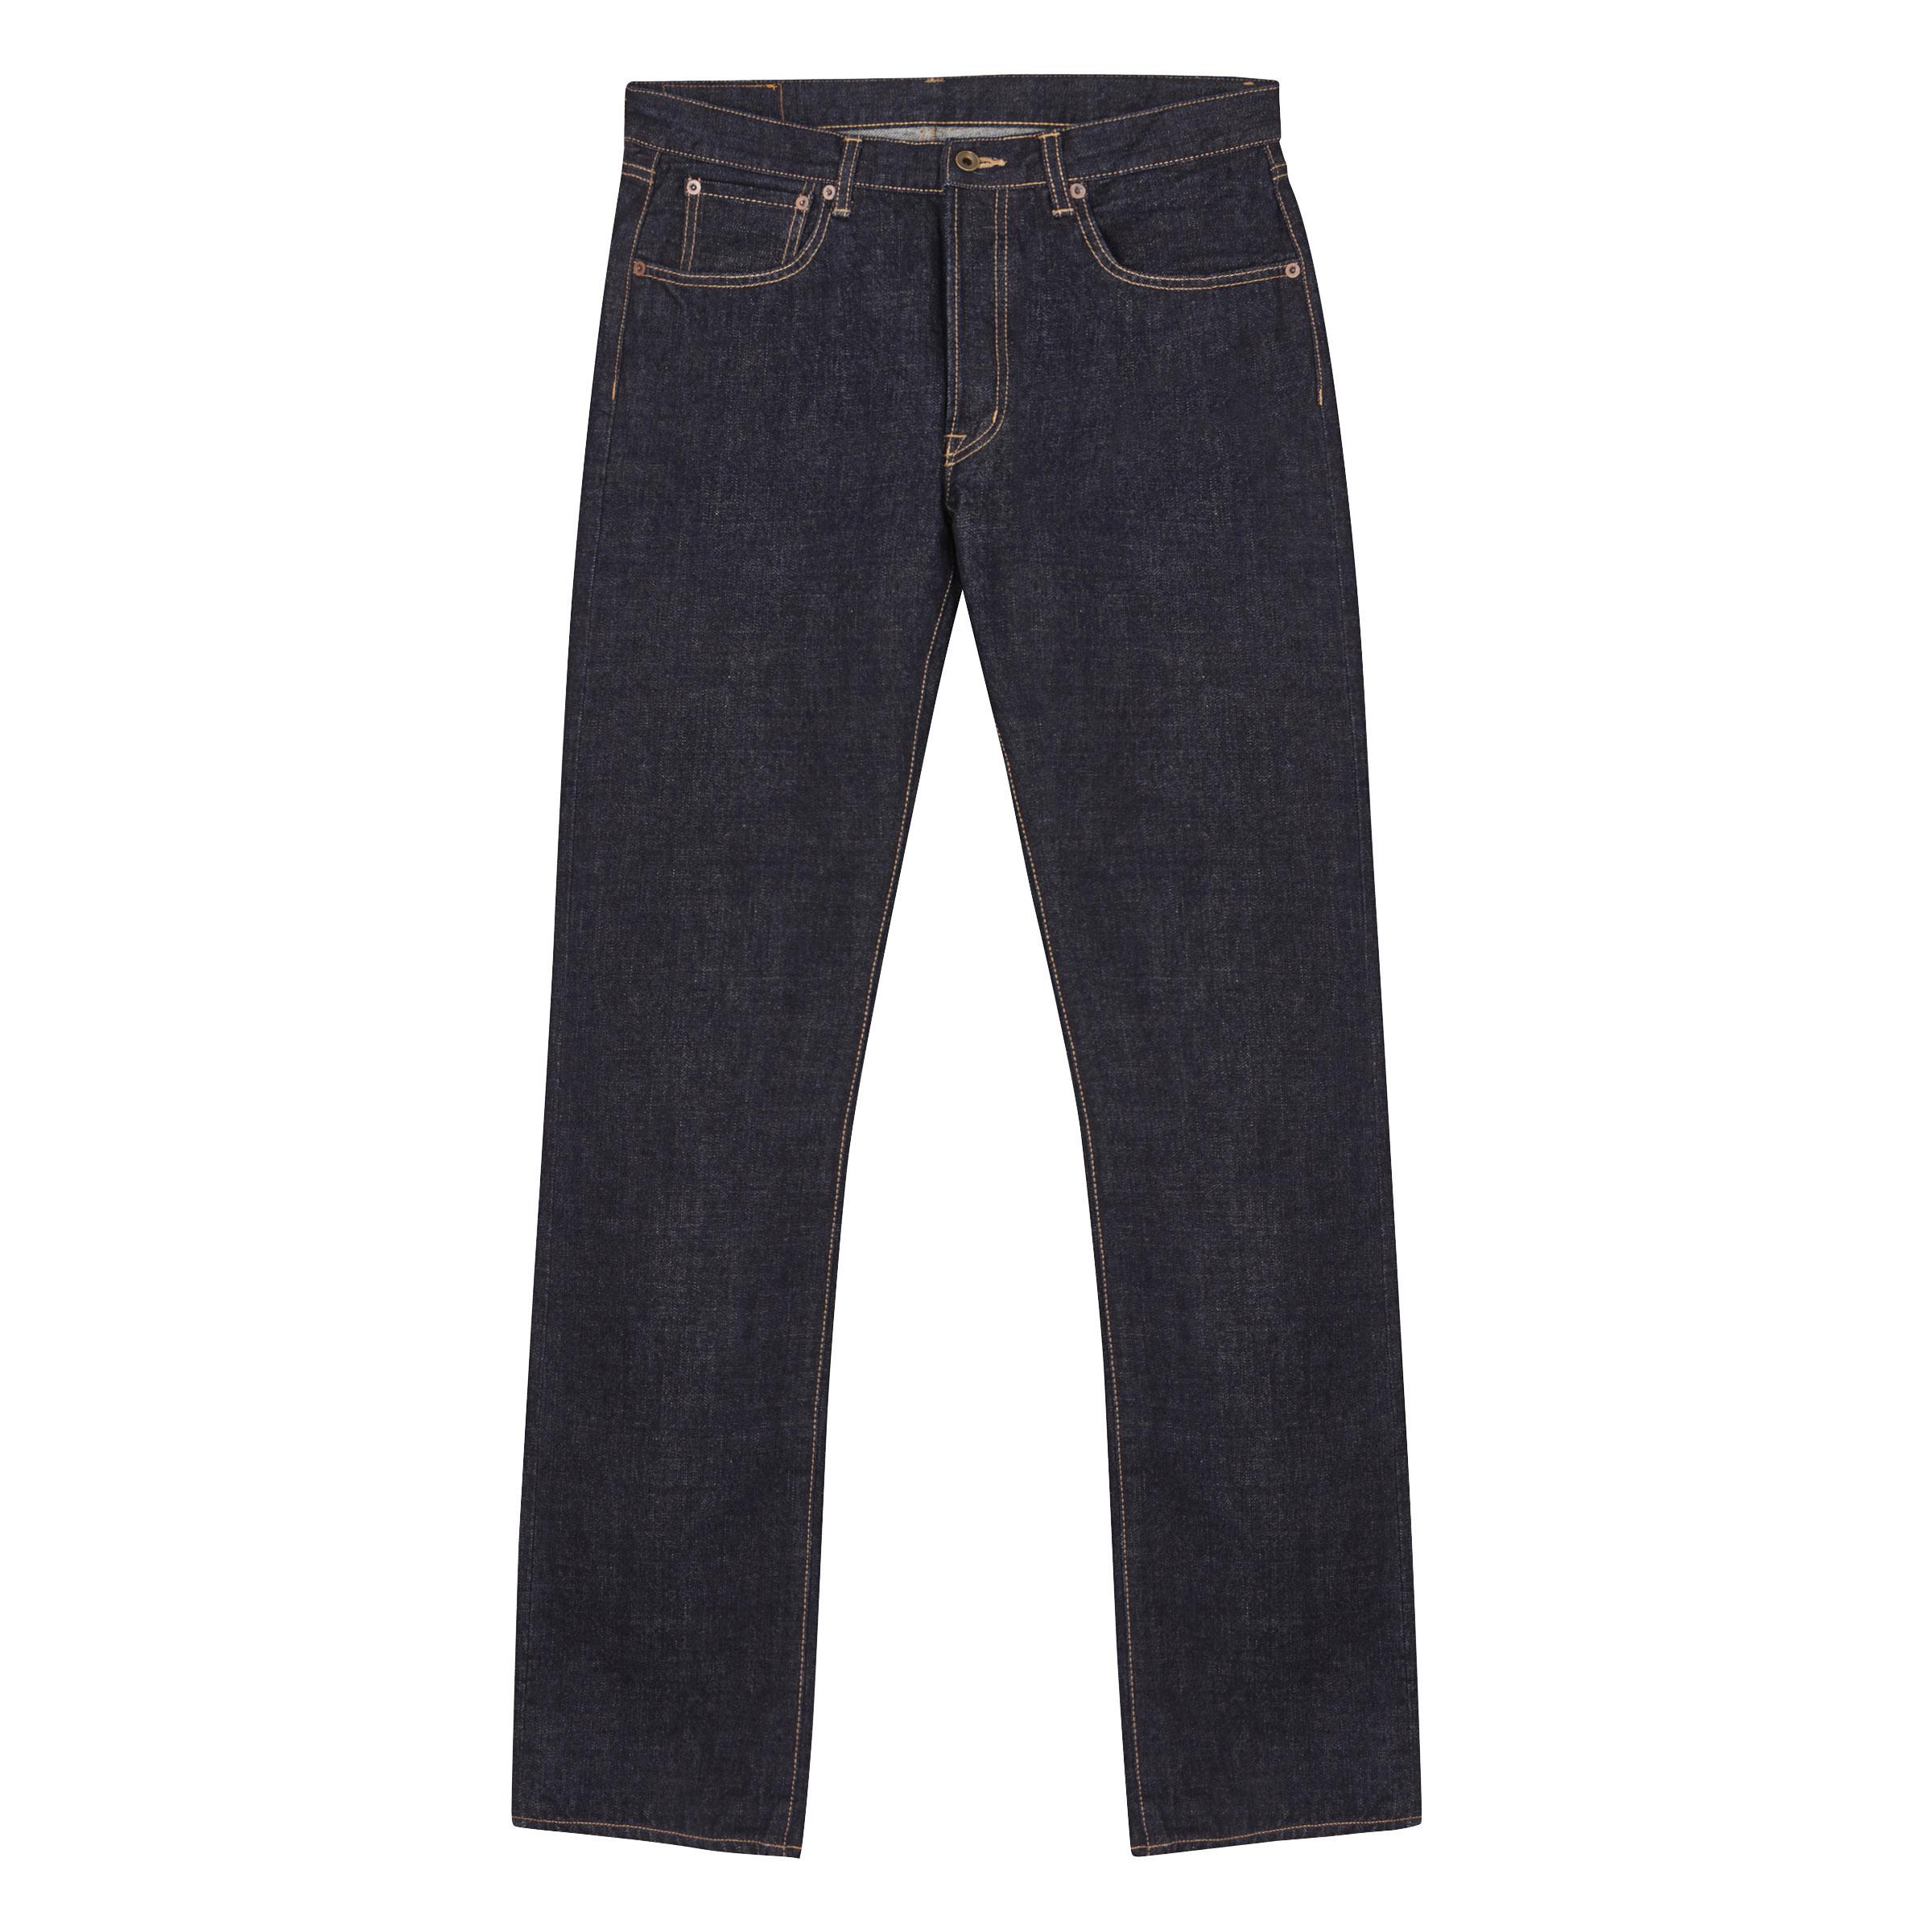 Navy Cotton Kurashiki Japanese Denim Button Fastening Jeans